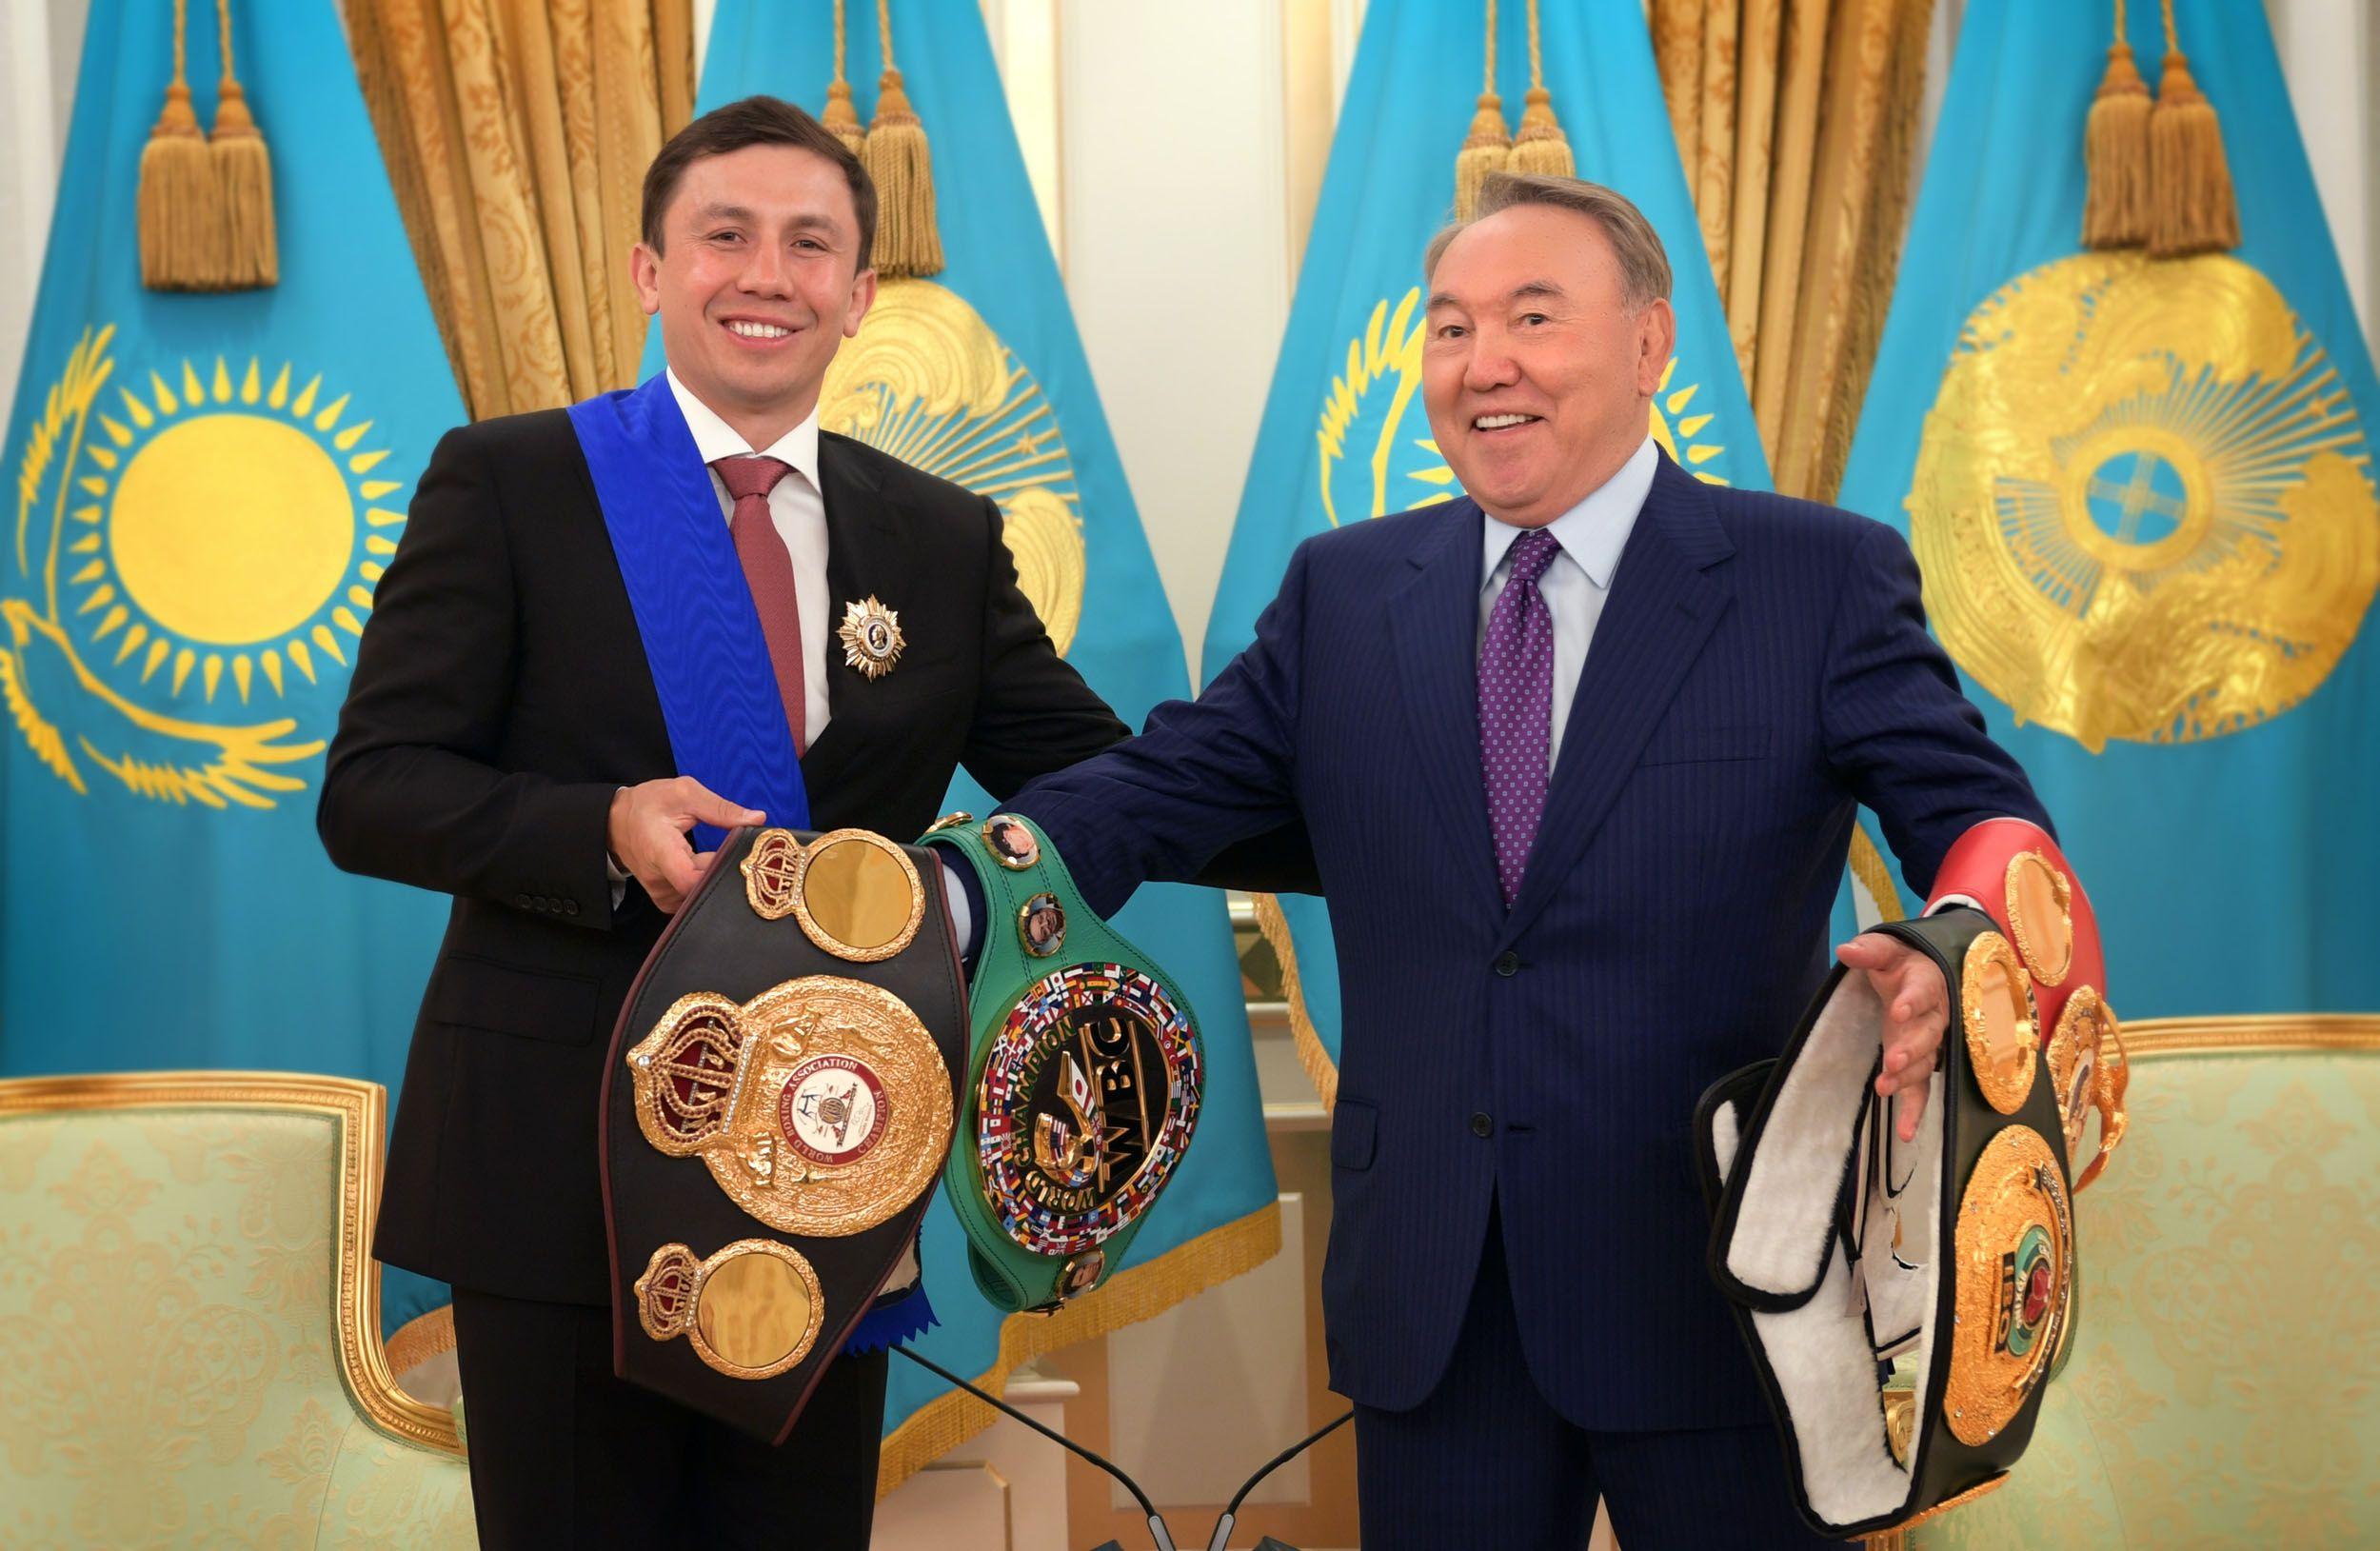 Геннадий Головкин подарил Президенту свои пояса- Kapital.kz